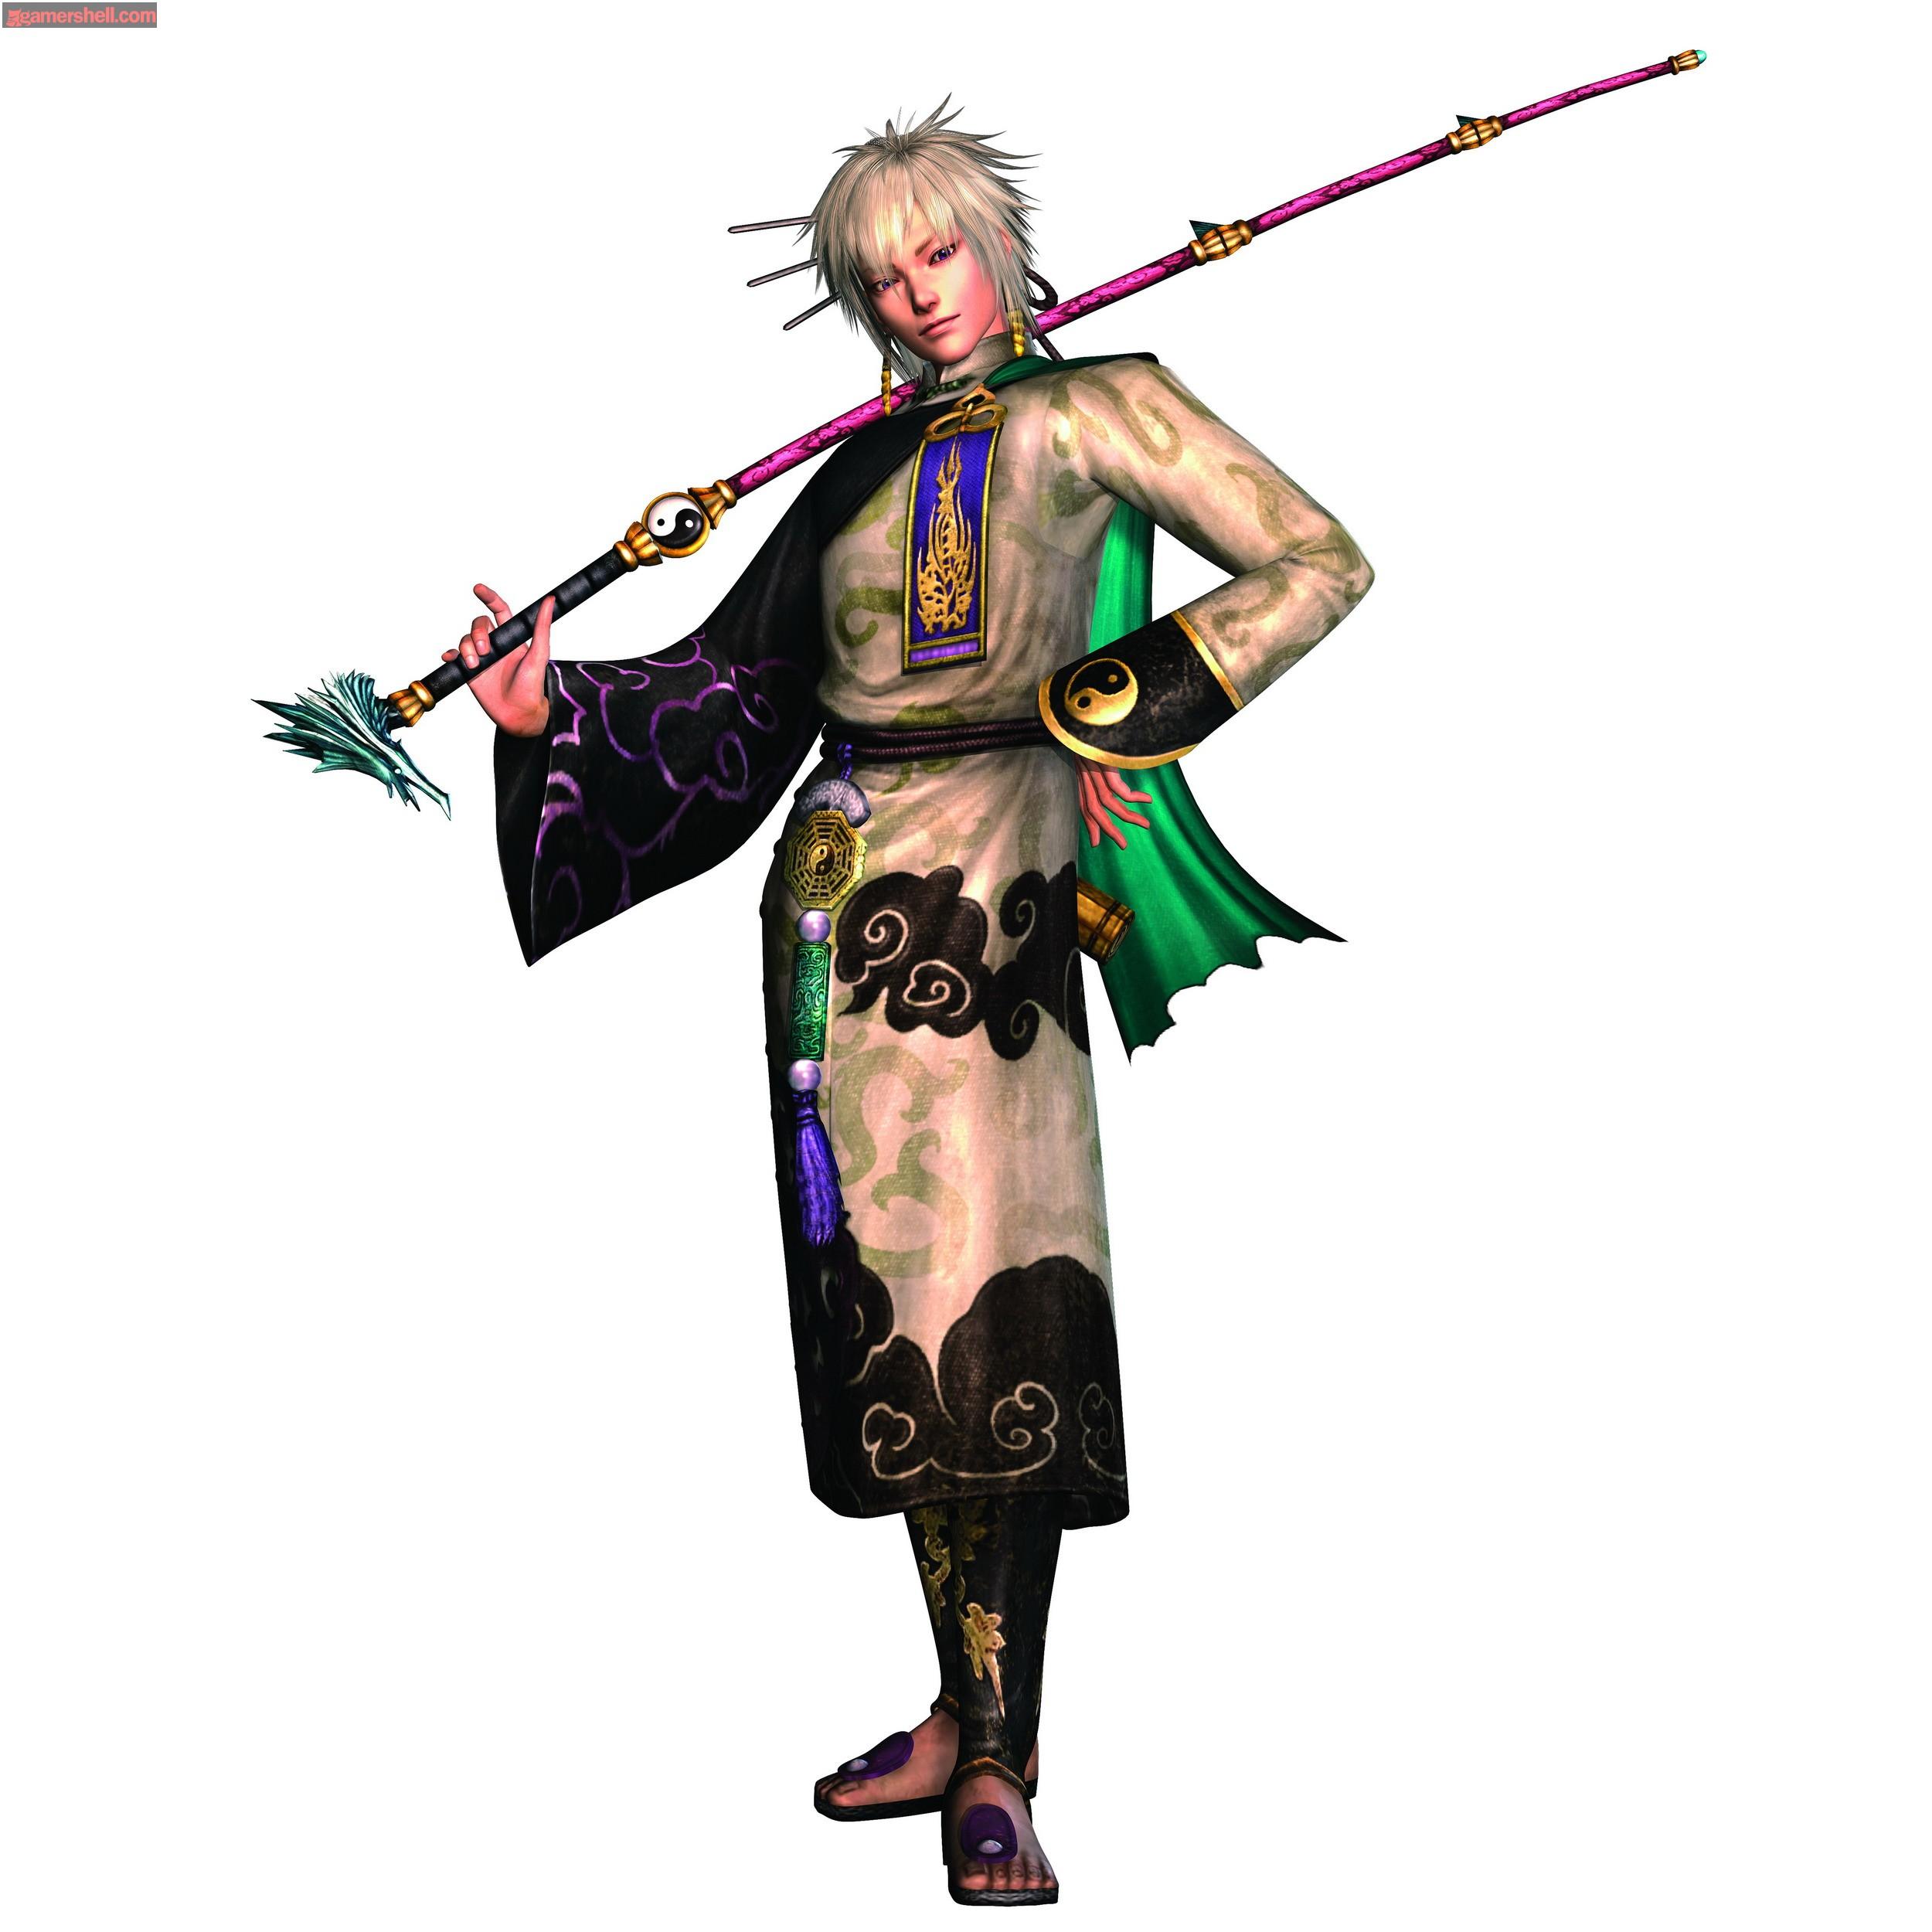 Warriors Orochi 3 Ultimate Cheats: FemaleCelebrity